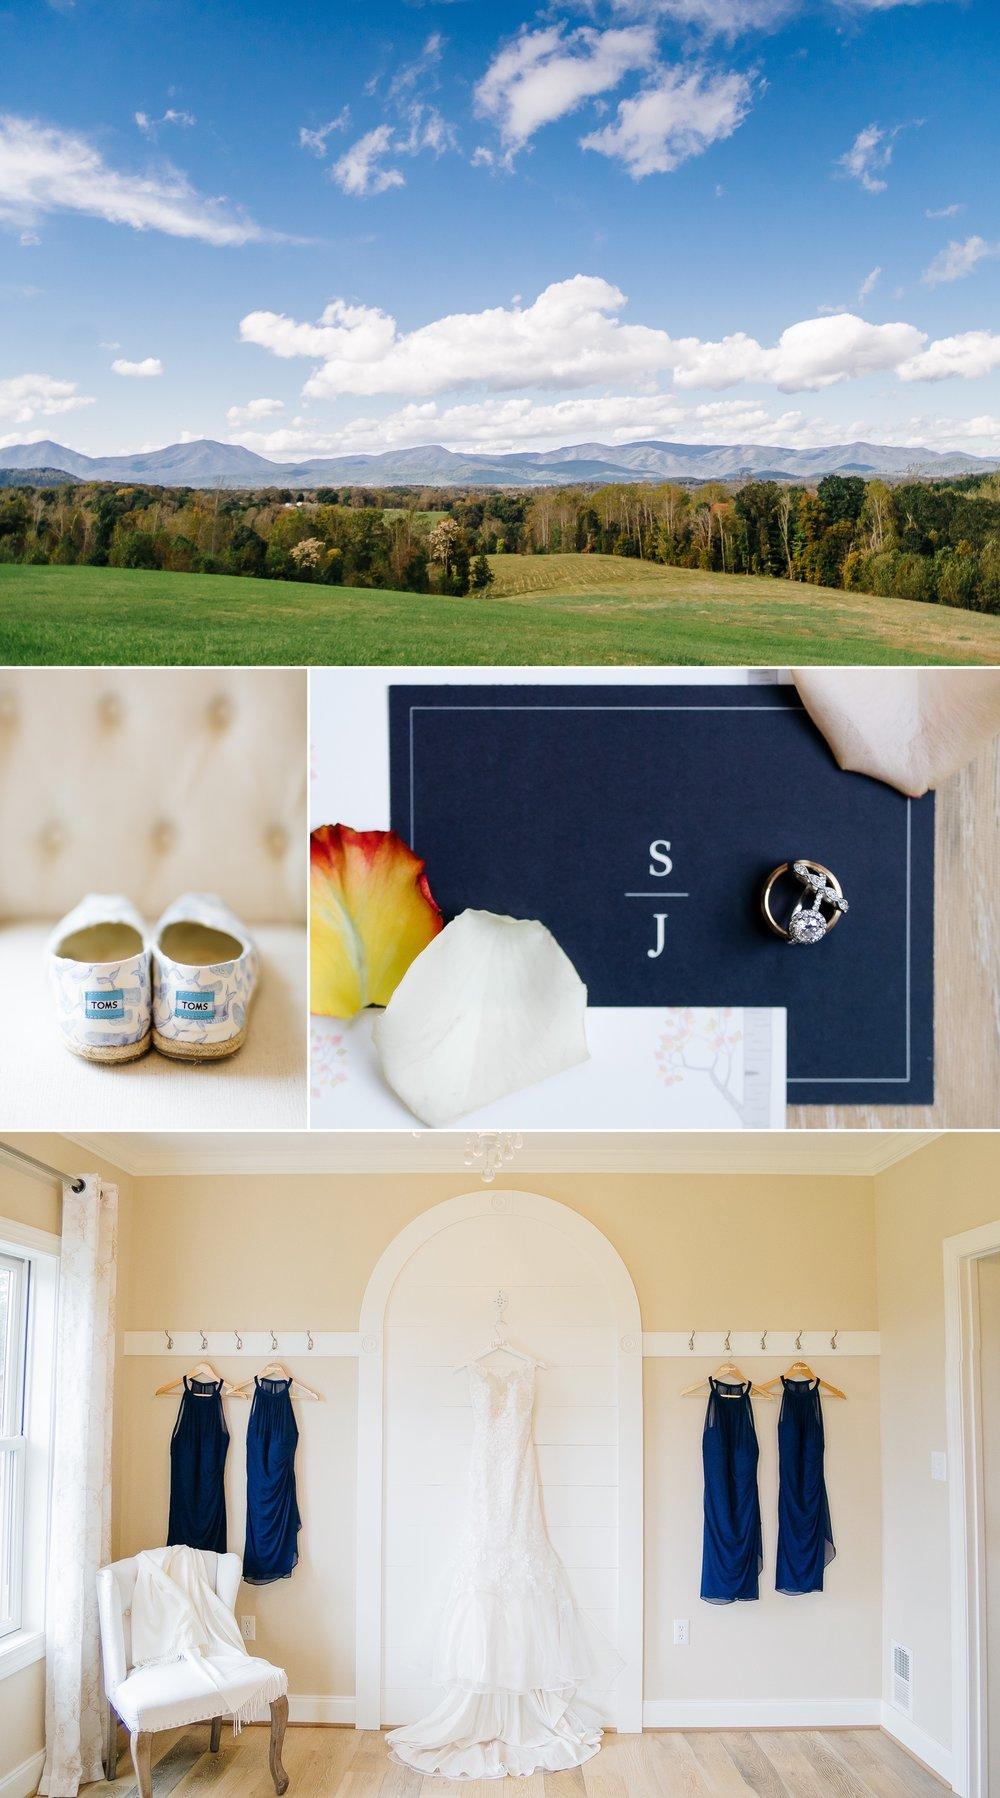 autumn_blue_ridge_mountain_wedding_at_sierra_vista_bedford_va_by_jonathan_hannah_photography